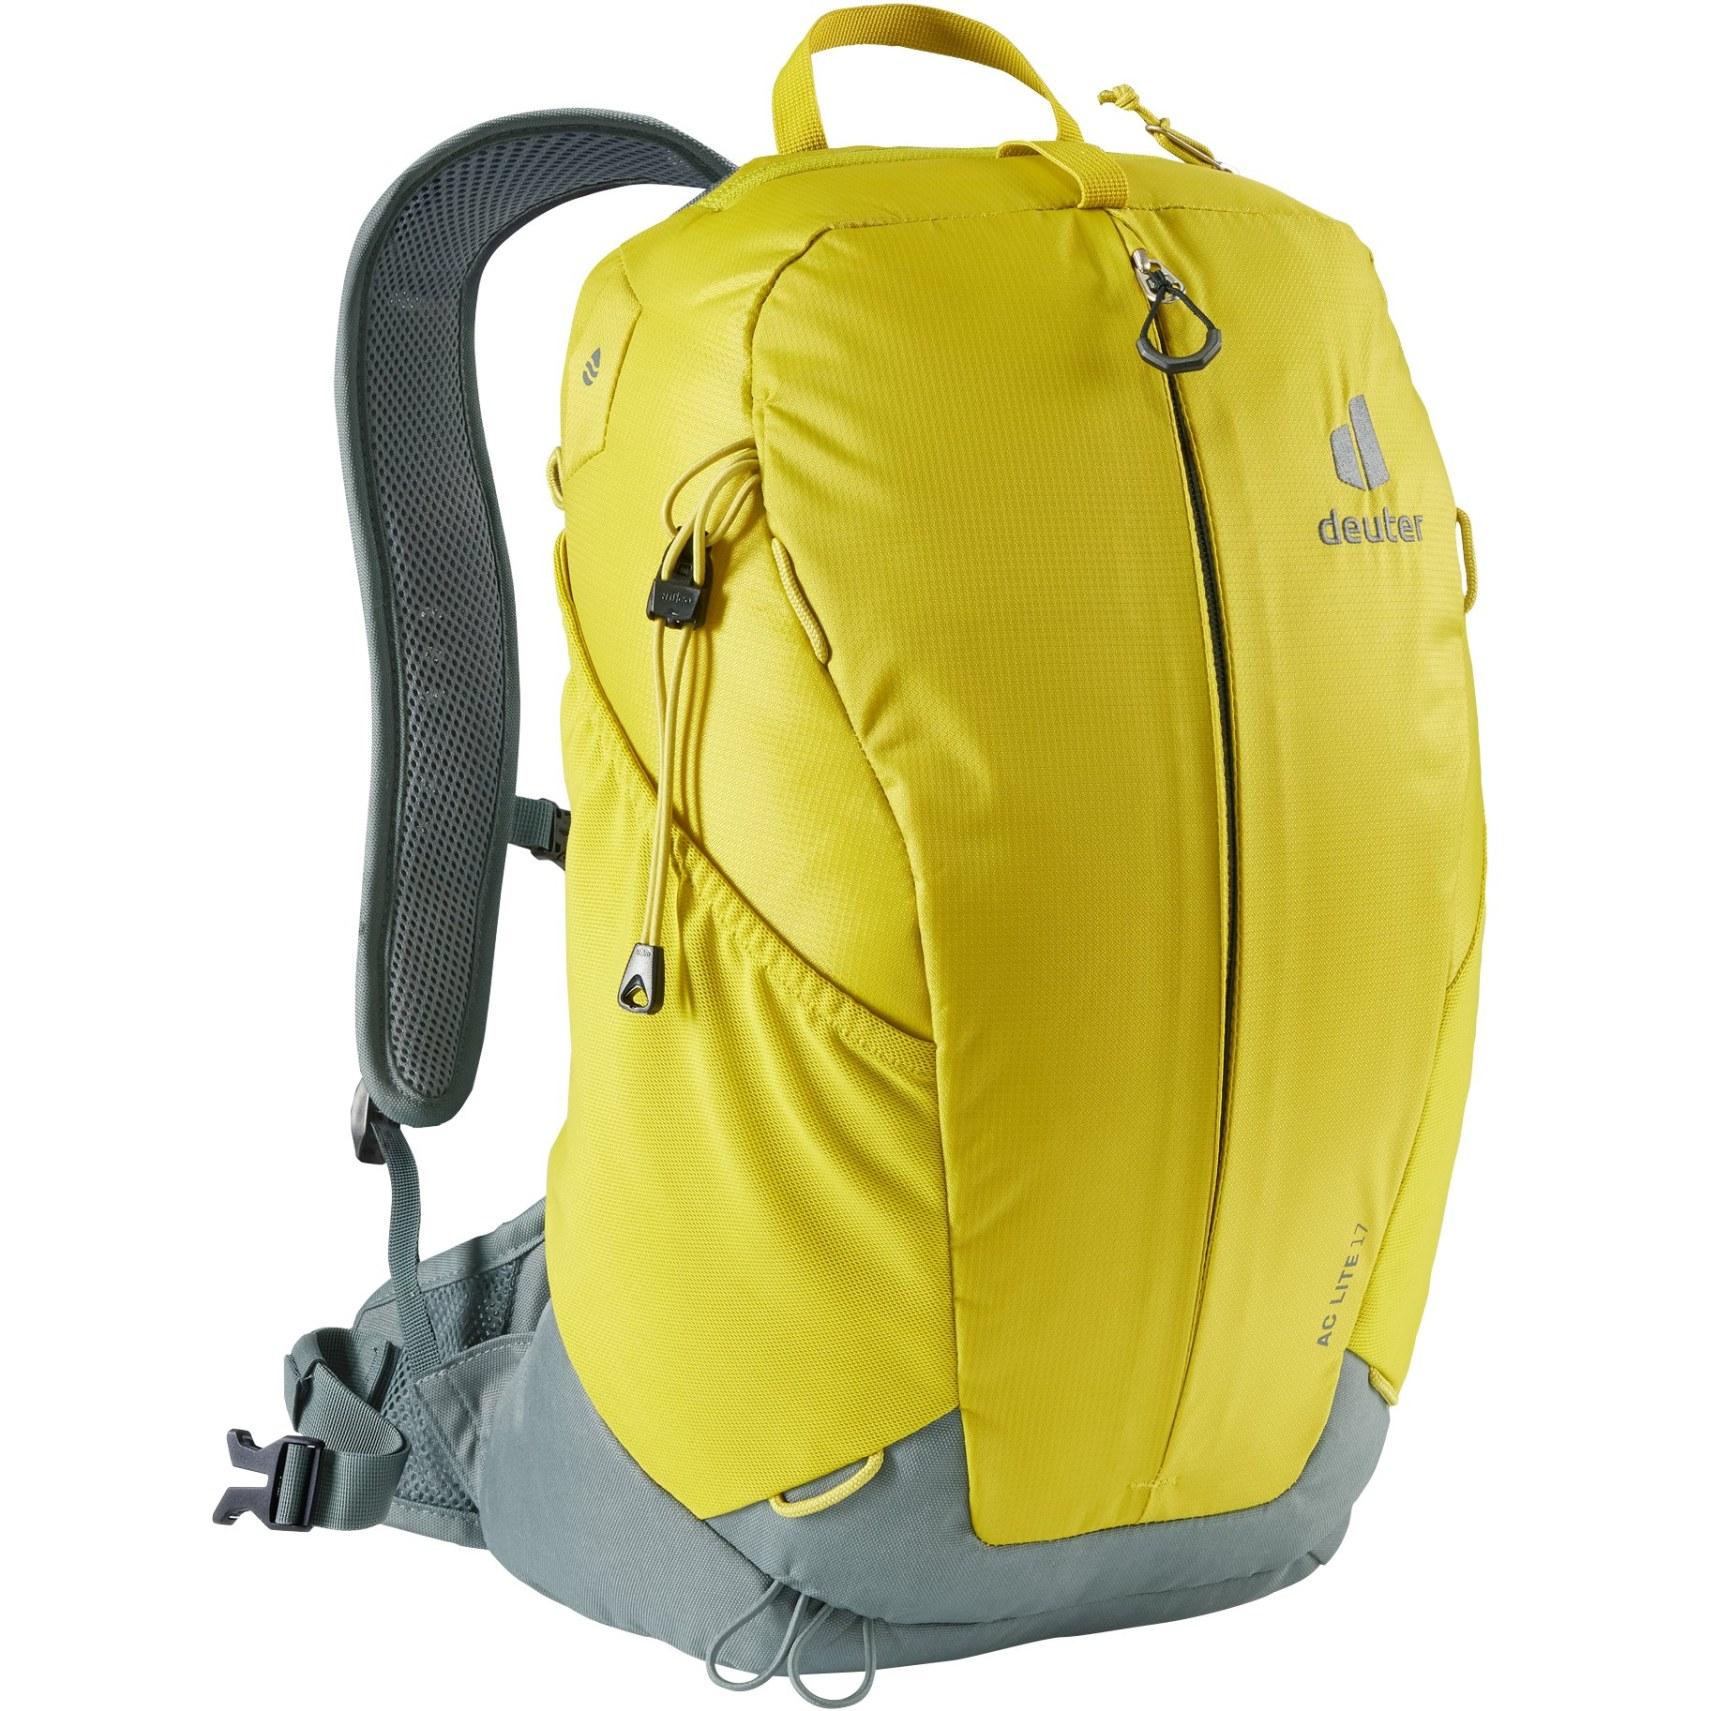 Deuter AC Lite 17 Backpack - greencurry-teal